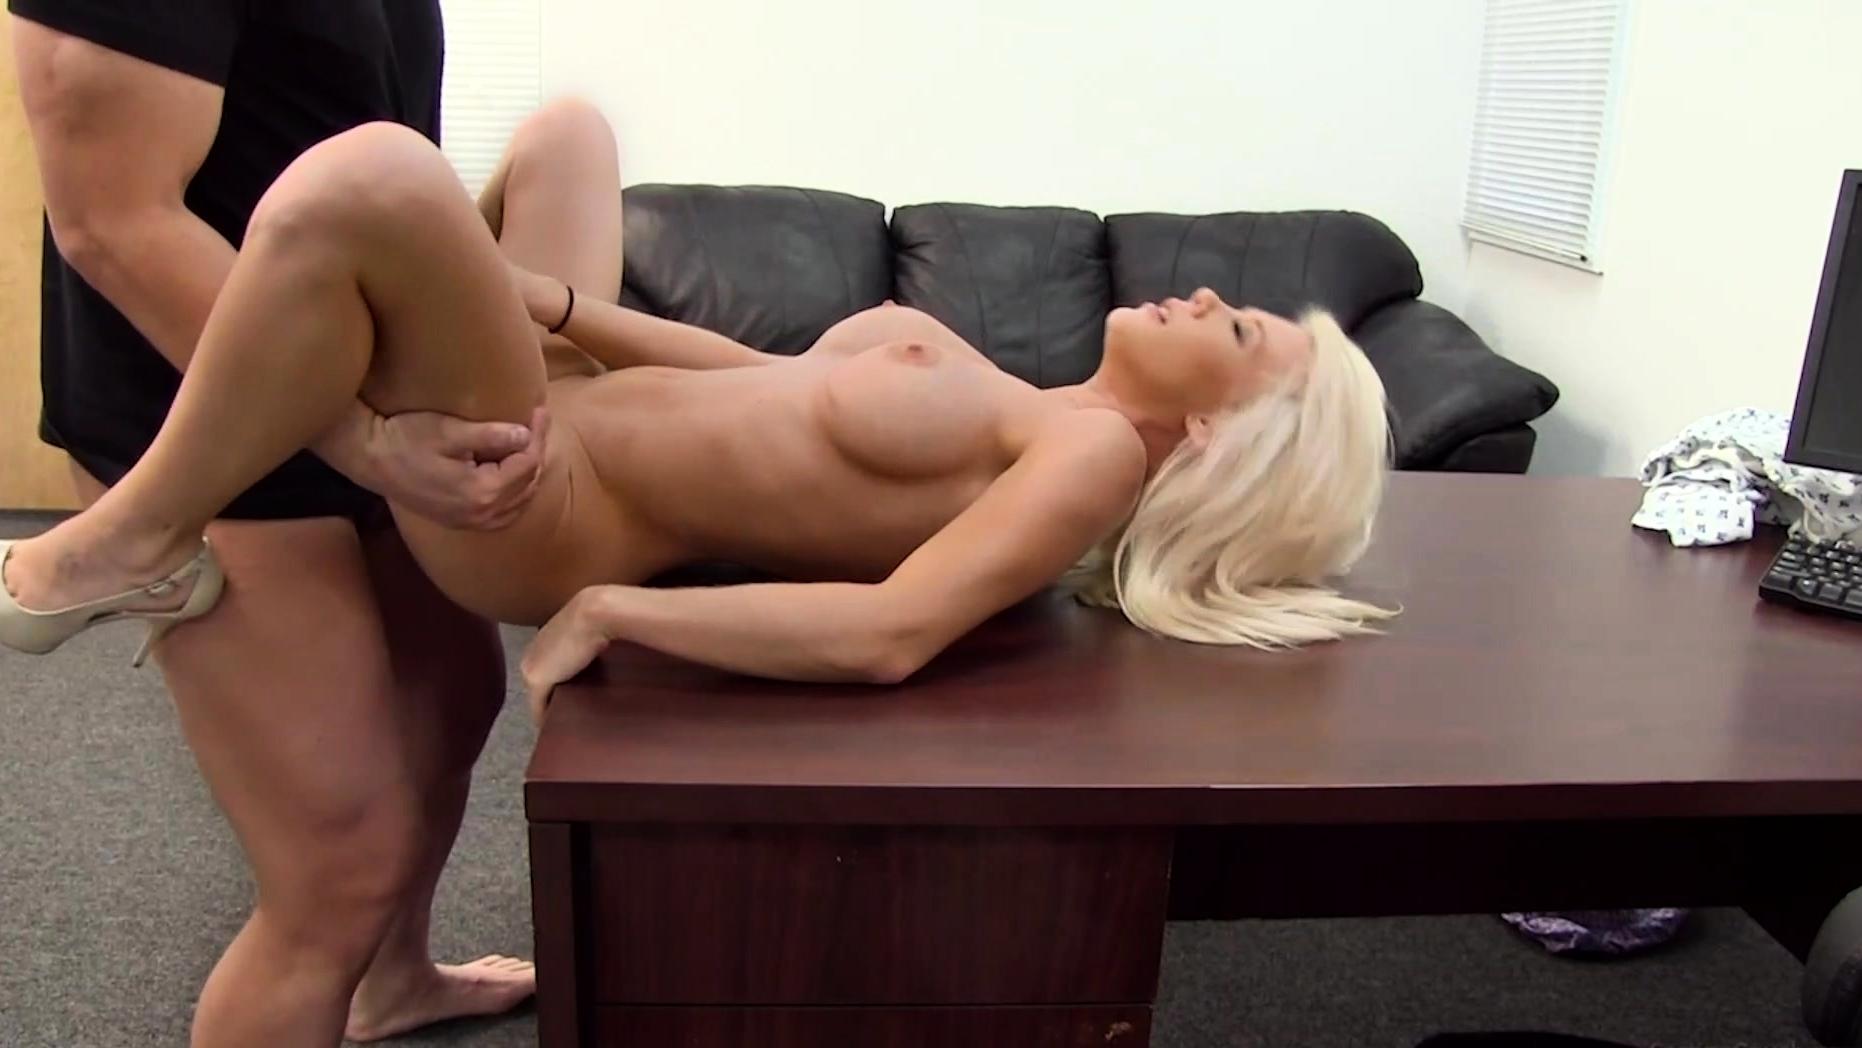 27yo Sales Girl Madeline Eats Cum After Audition!